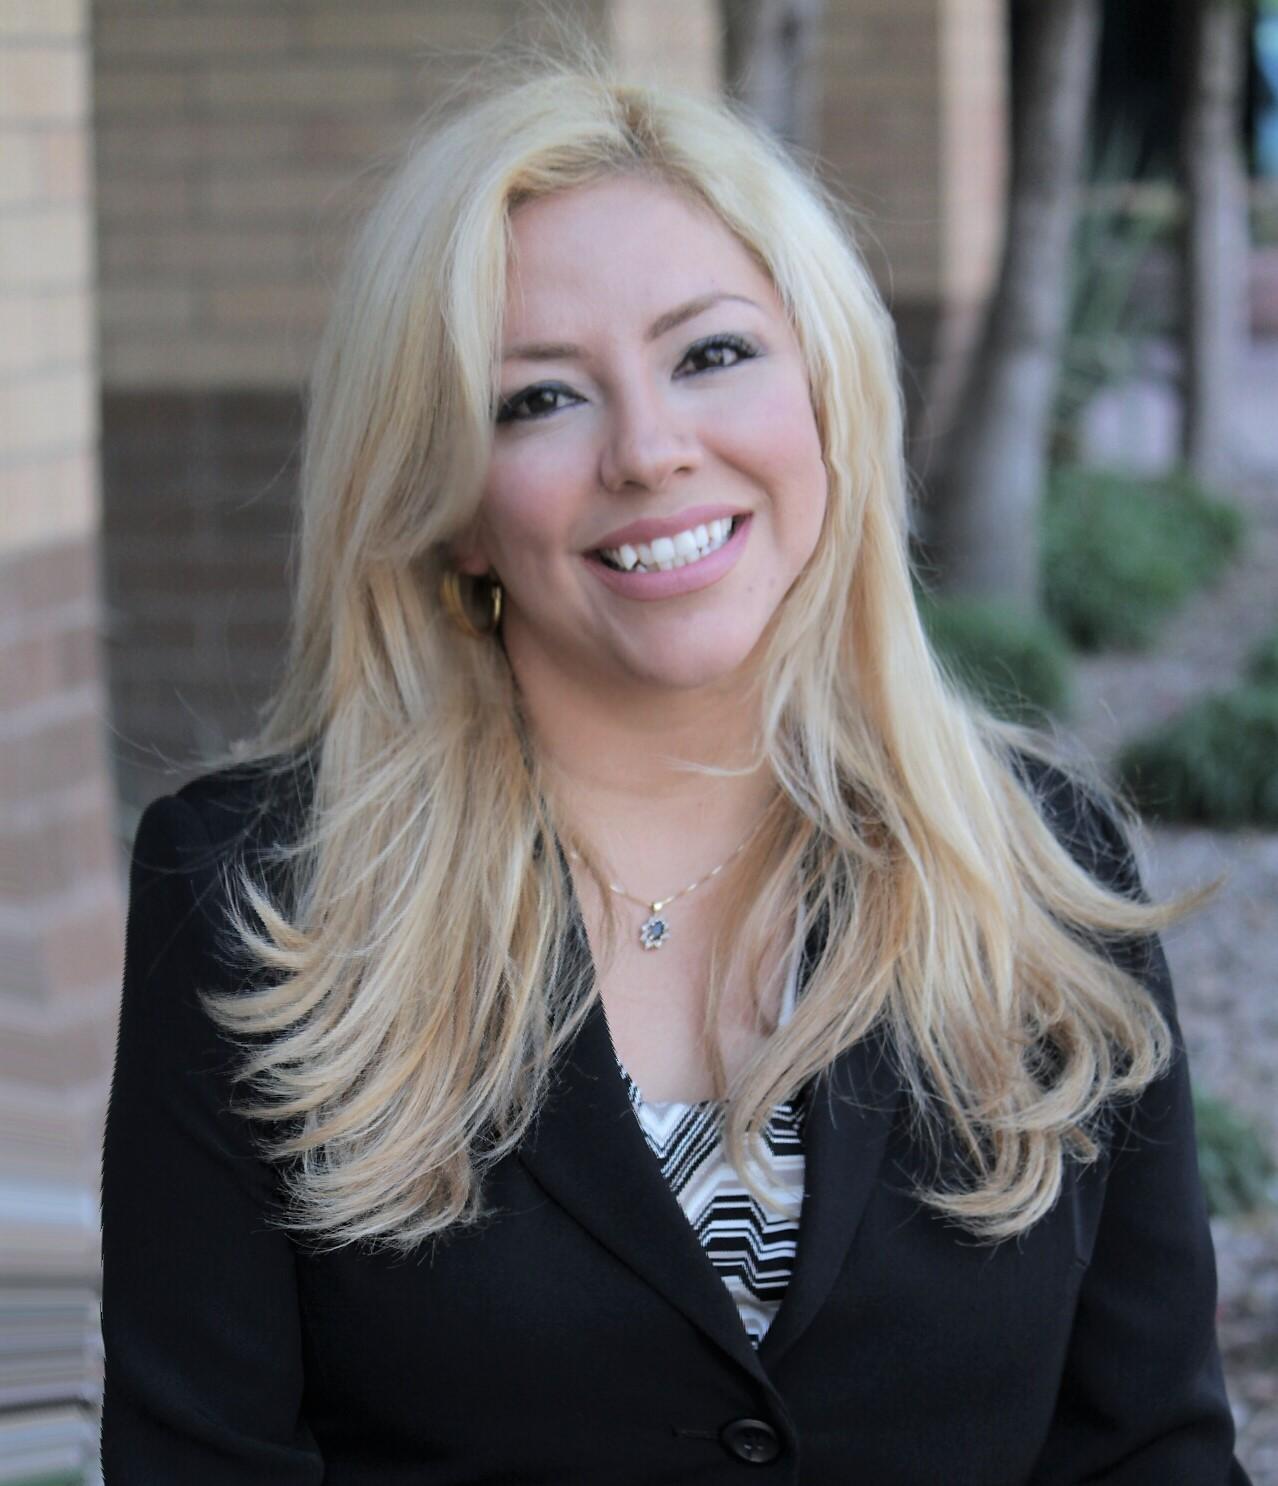 Erika Nevarez